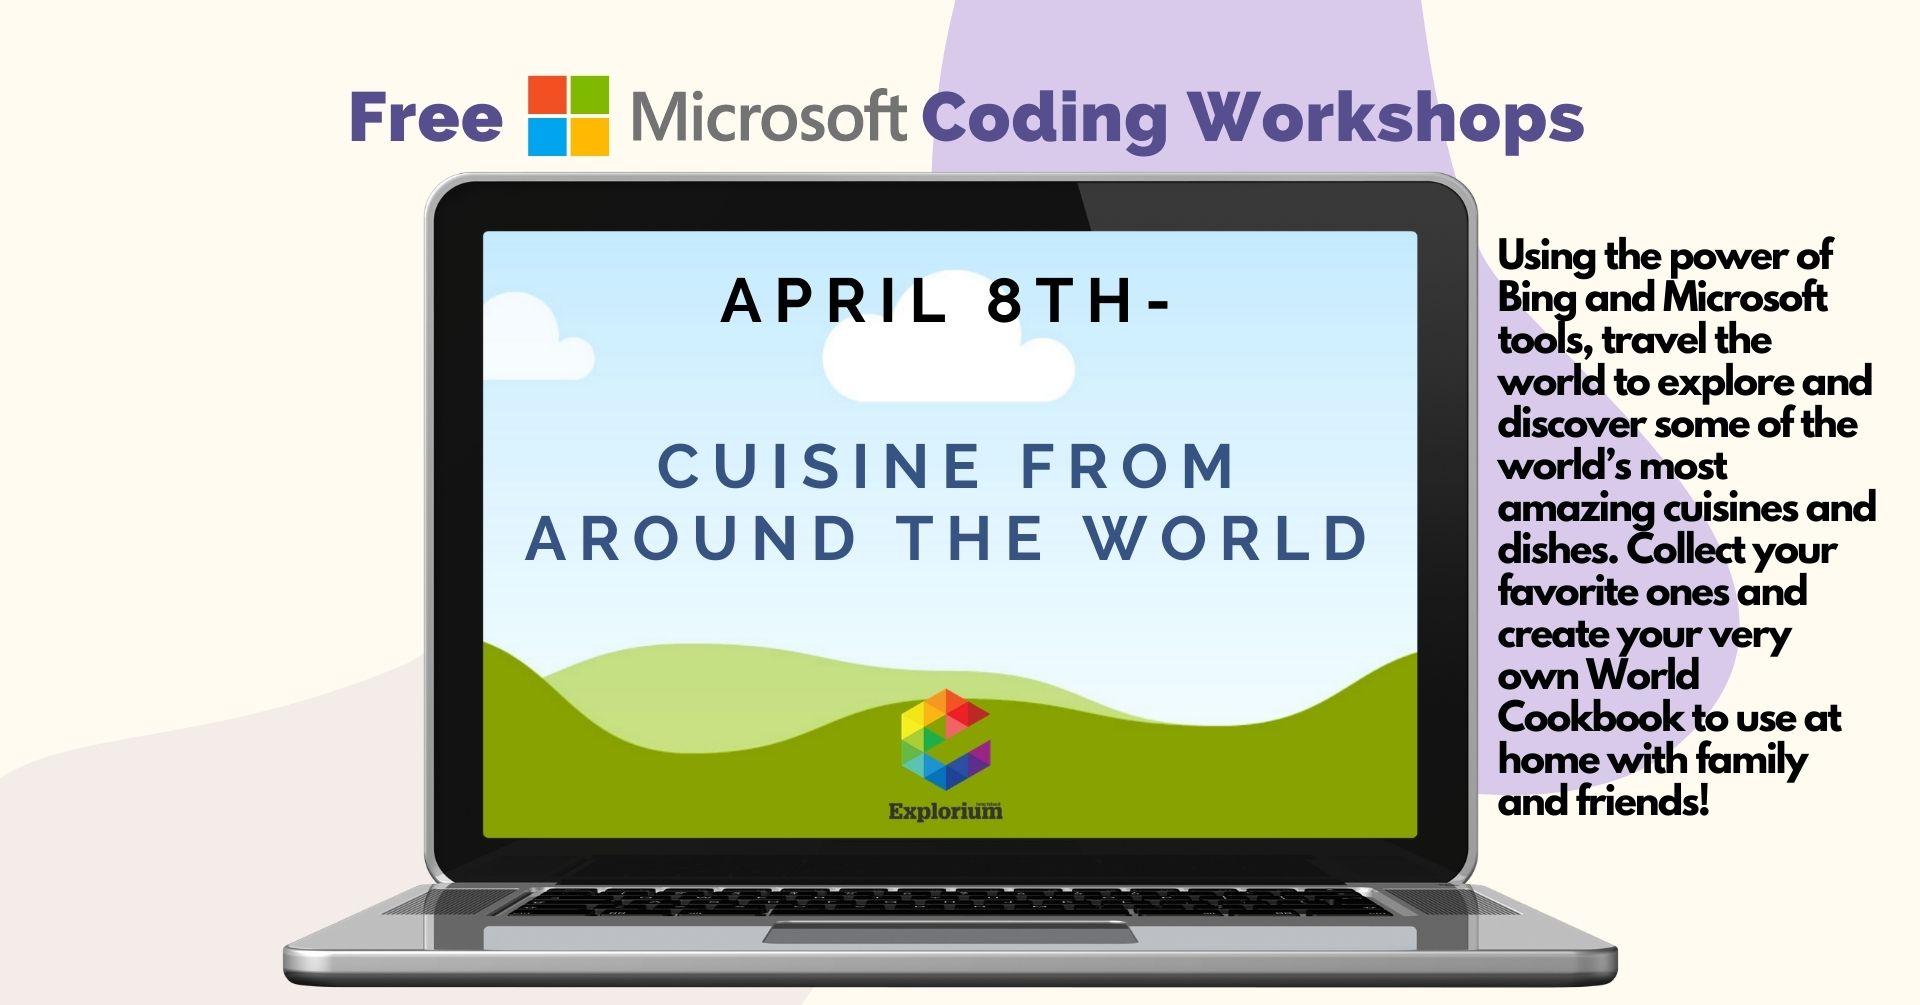 April 8th Microsoft Wksp